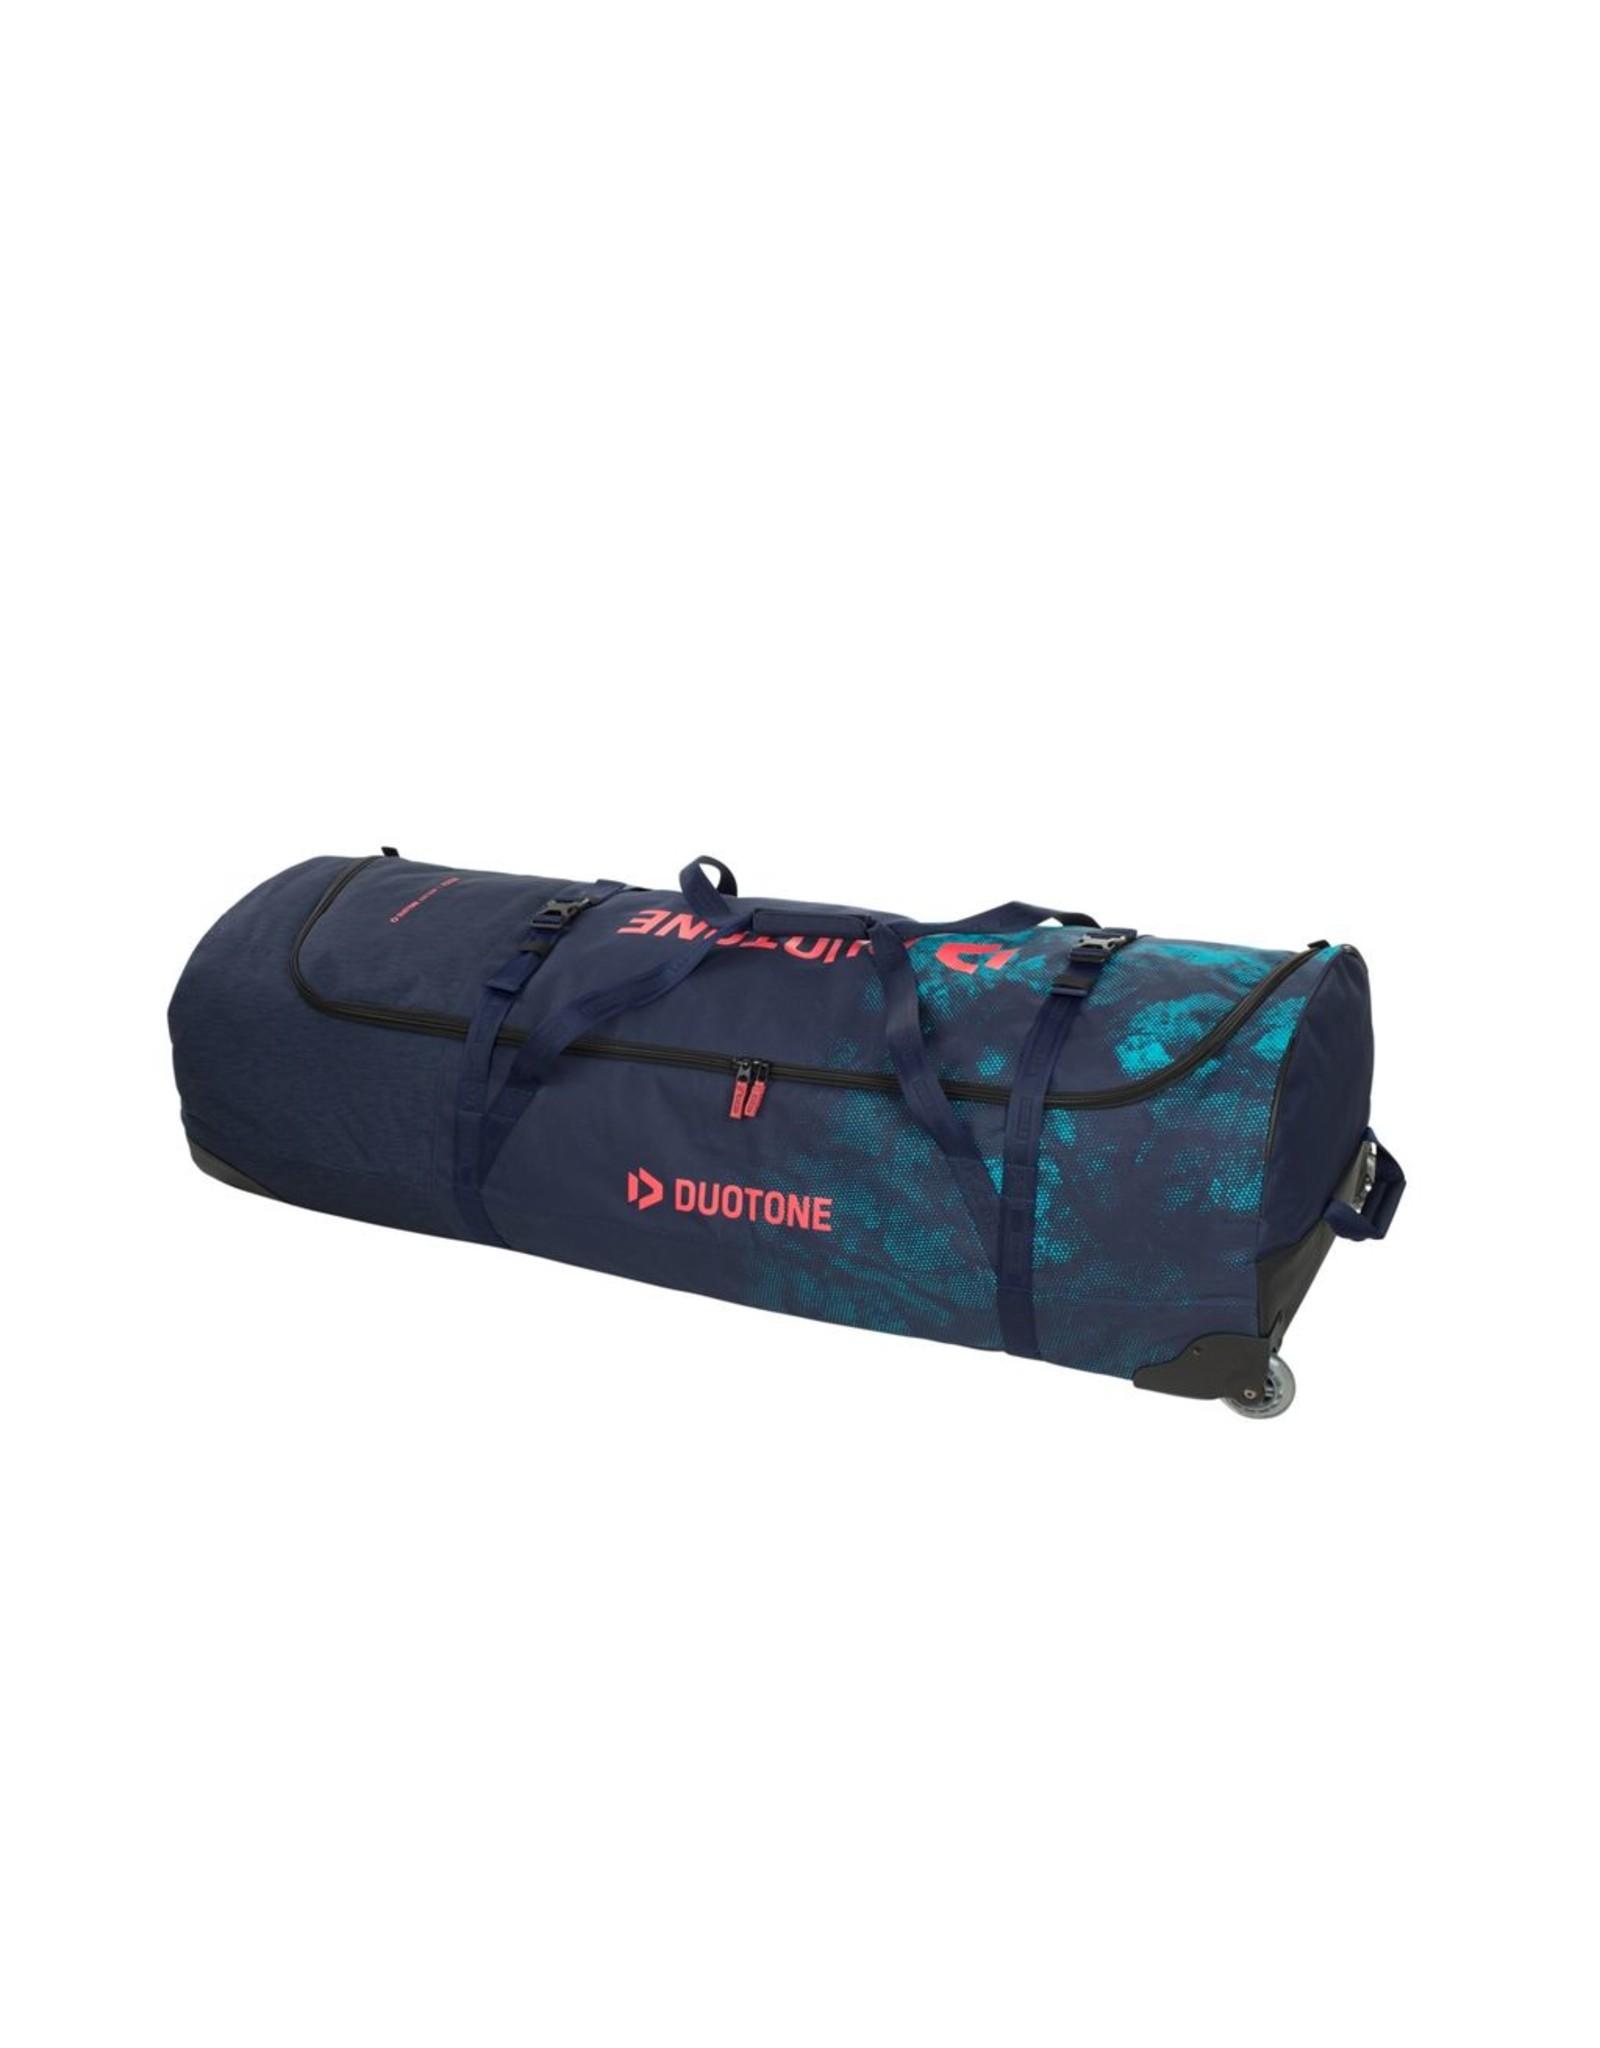 Duotone Duotone - Combi Bag - 139 - Blue